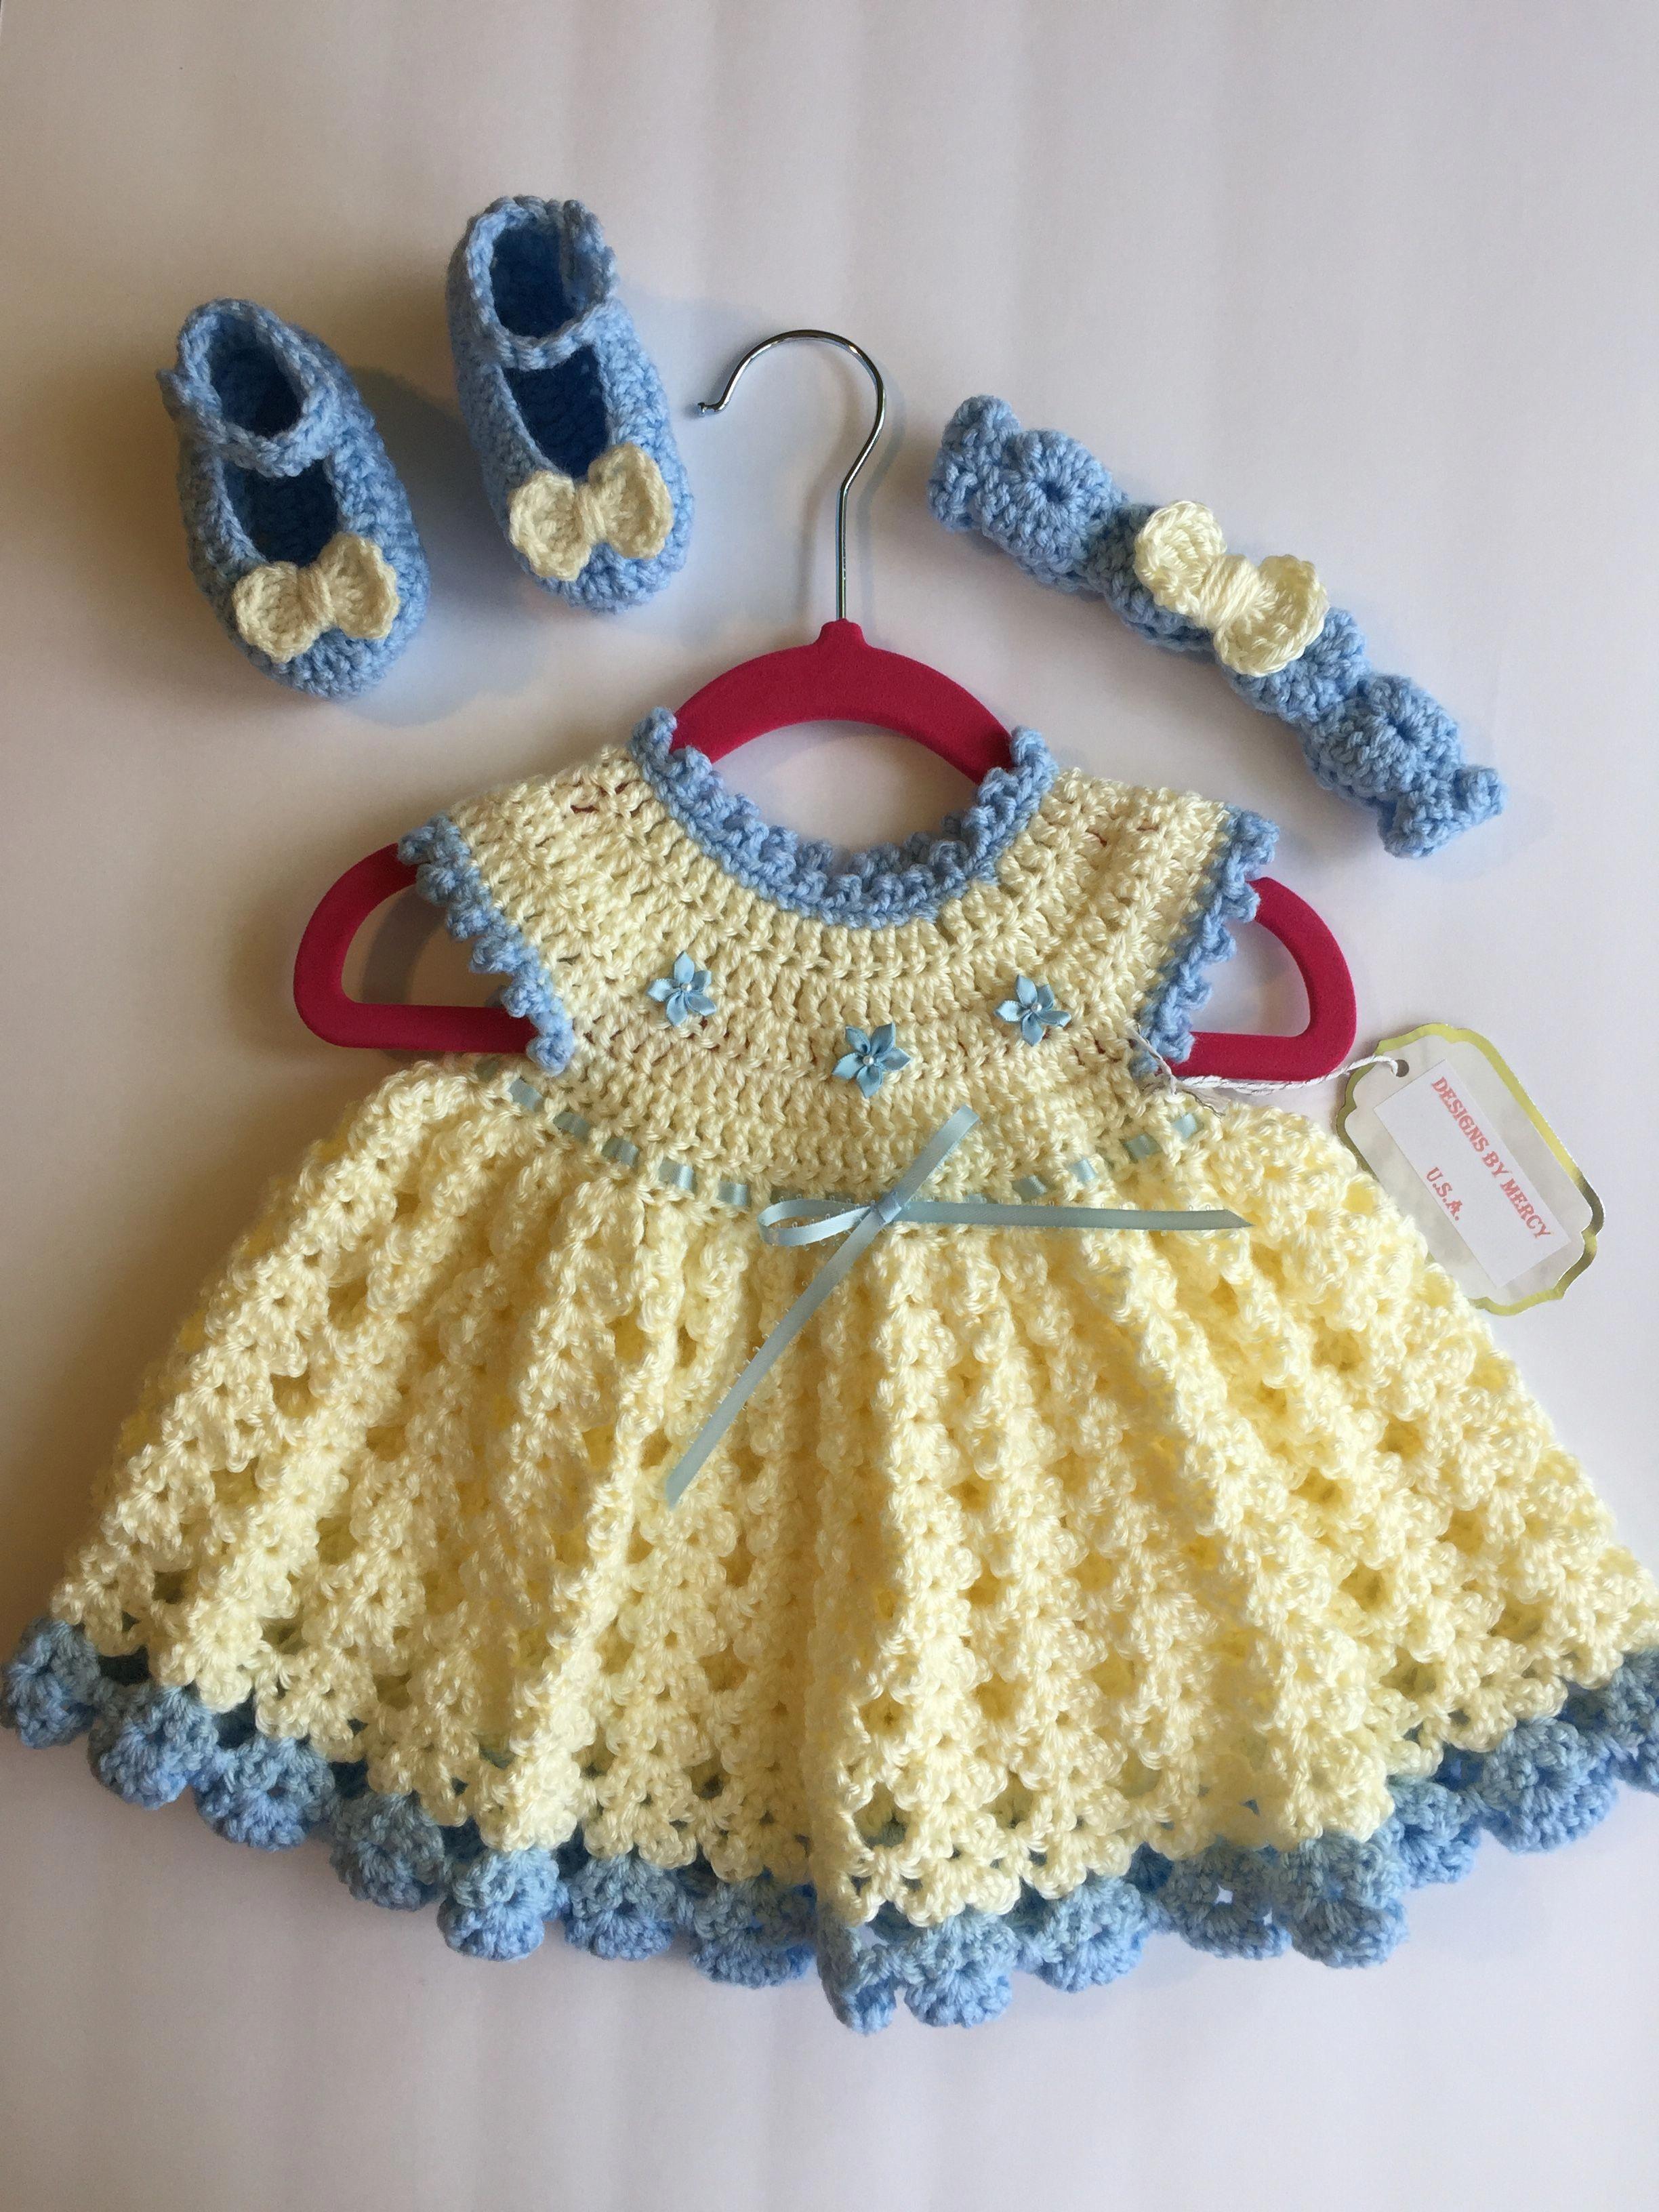 6d20b17a55f7 Ivory and Blue Crochet Baby Dress Blue Crochet Baby Headband Blue ...